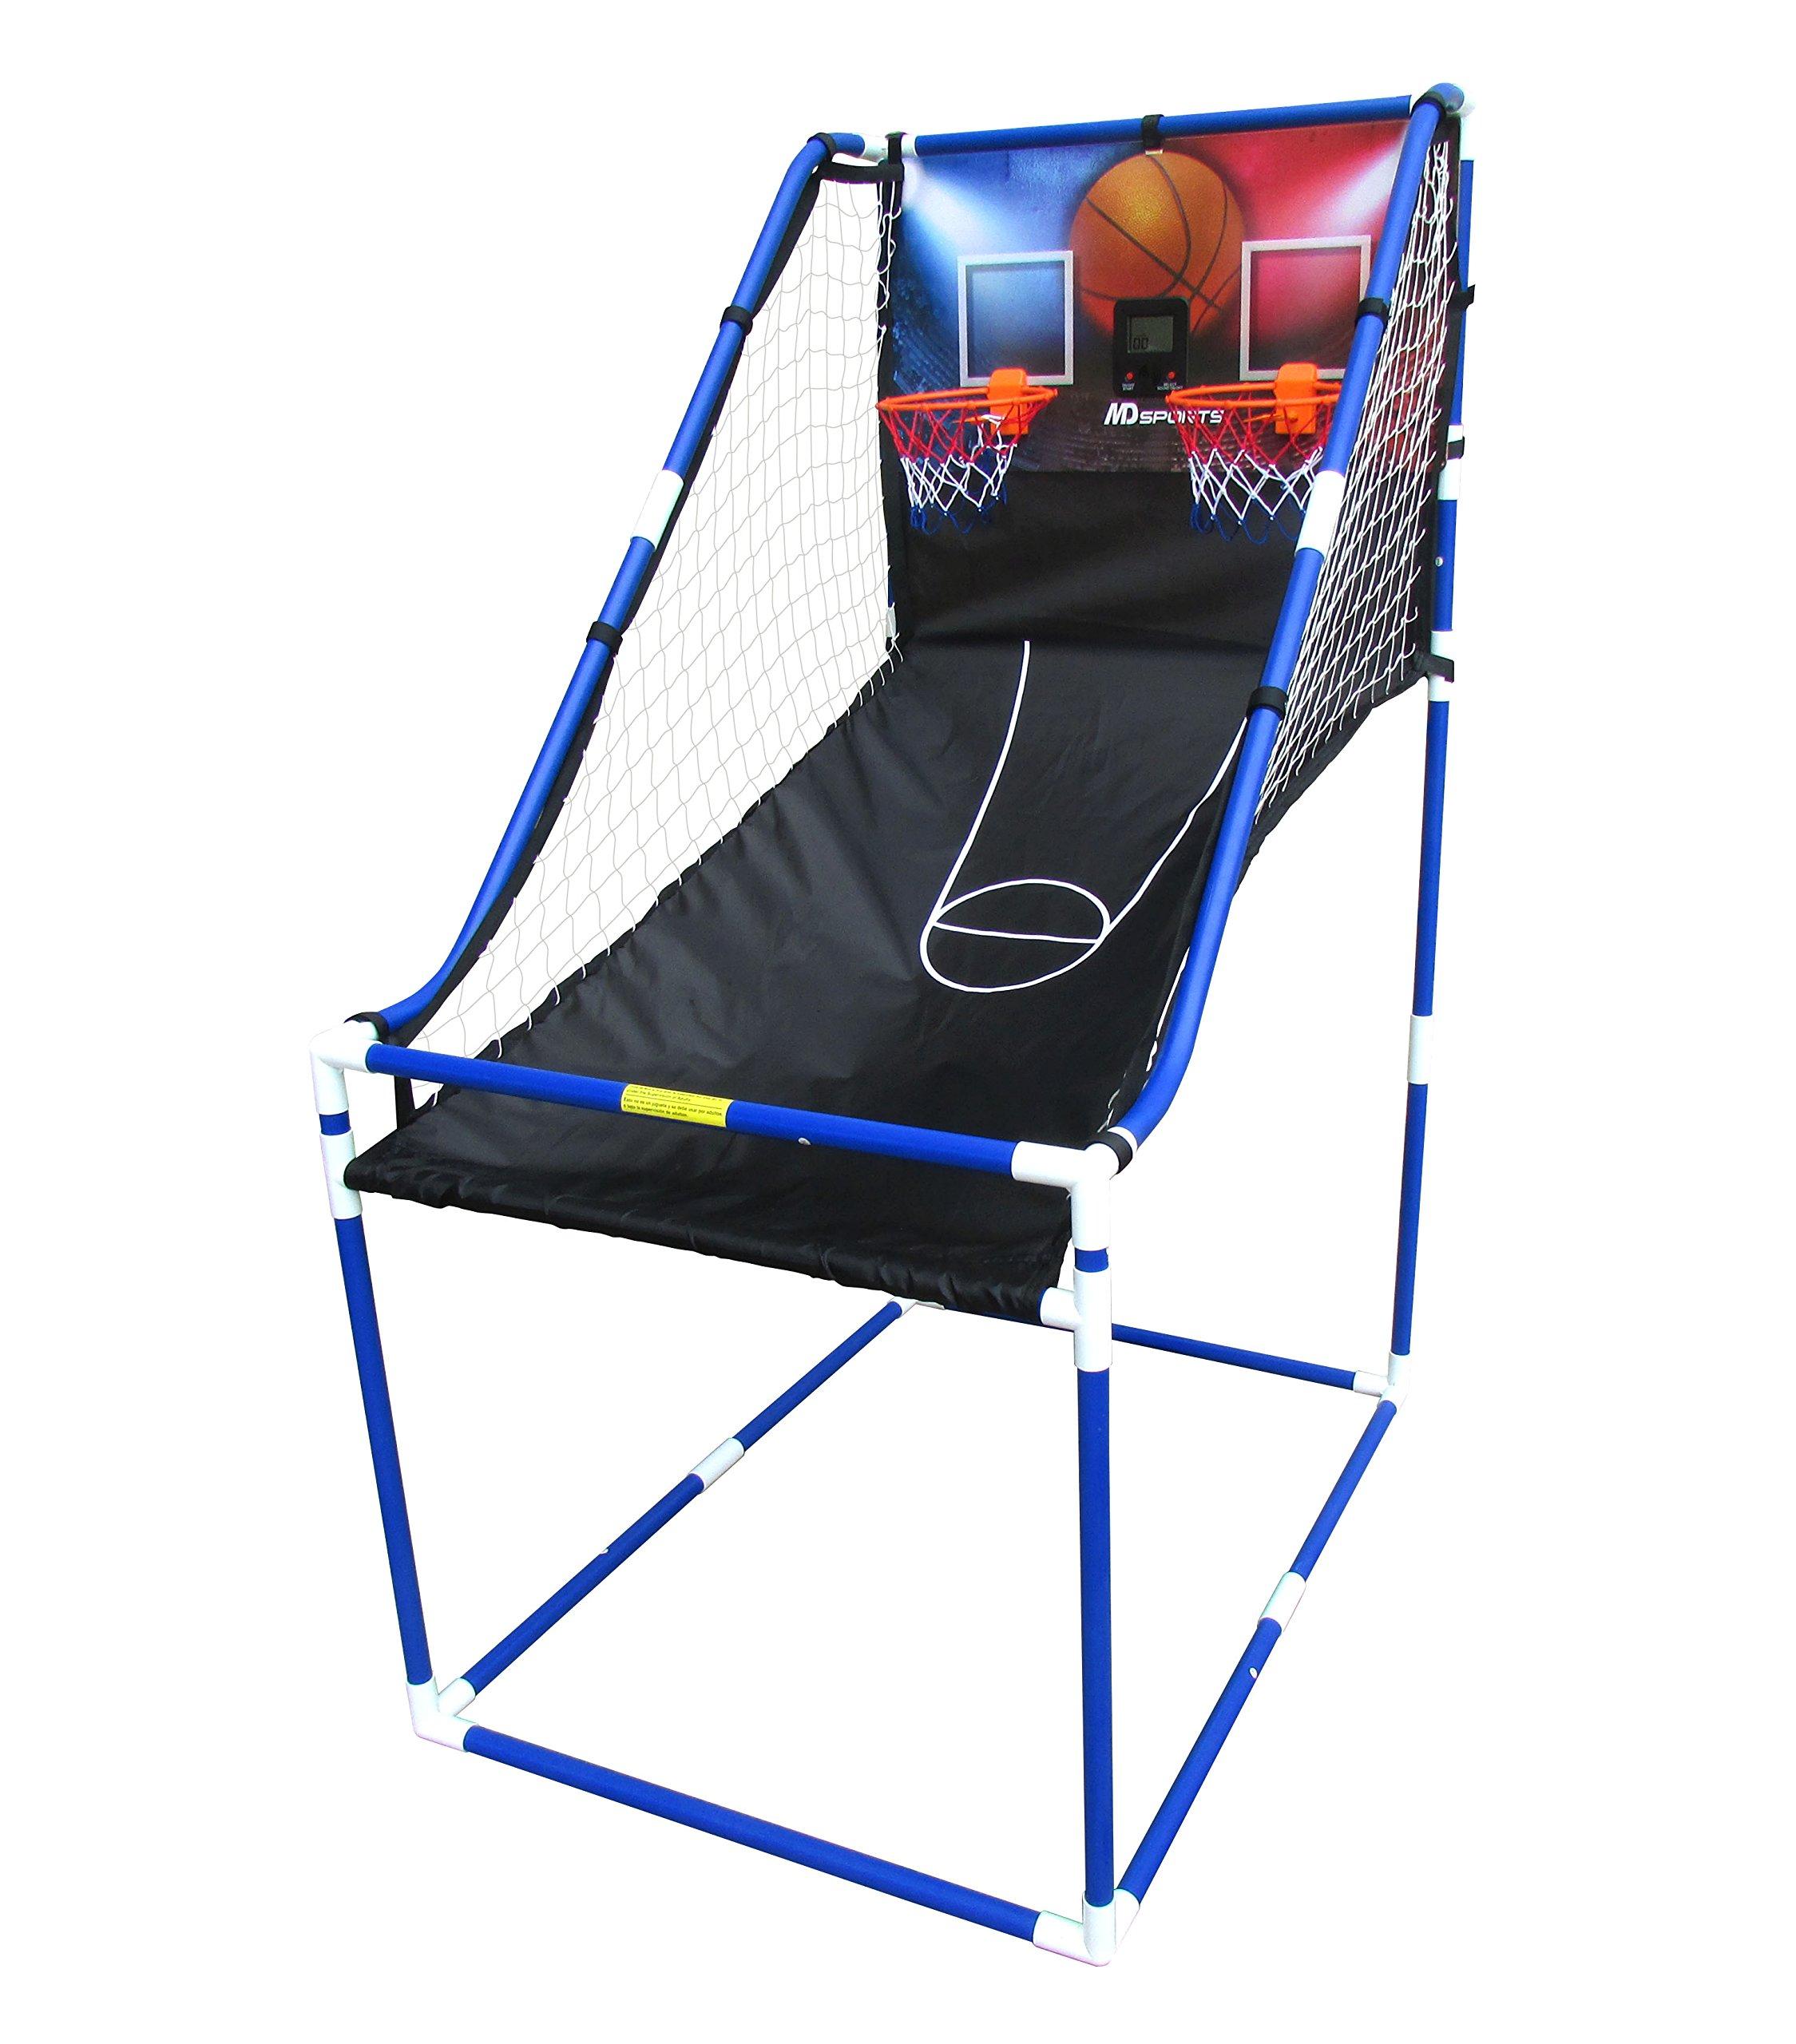 MD Sports 2 Player Junior Arcade Basketball